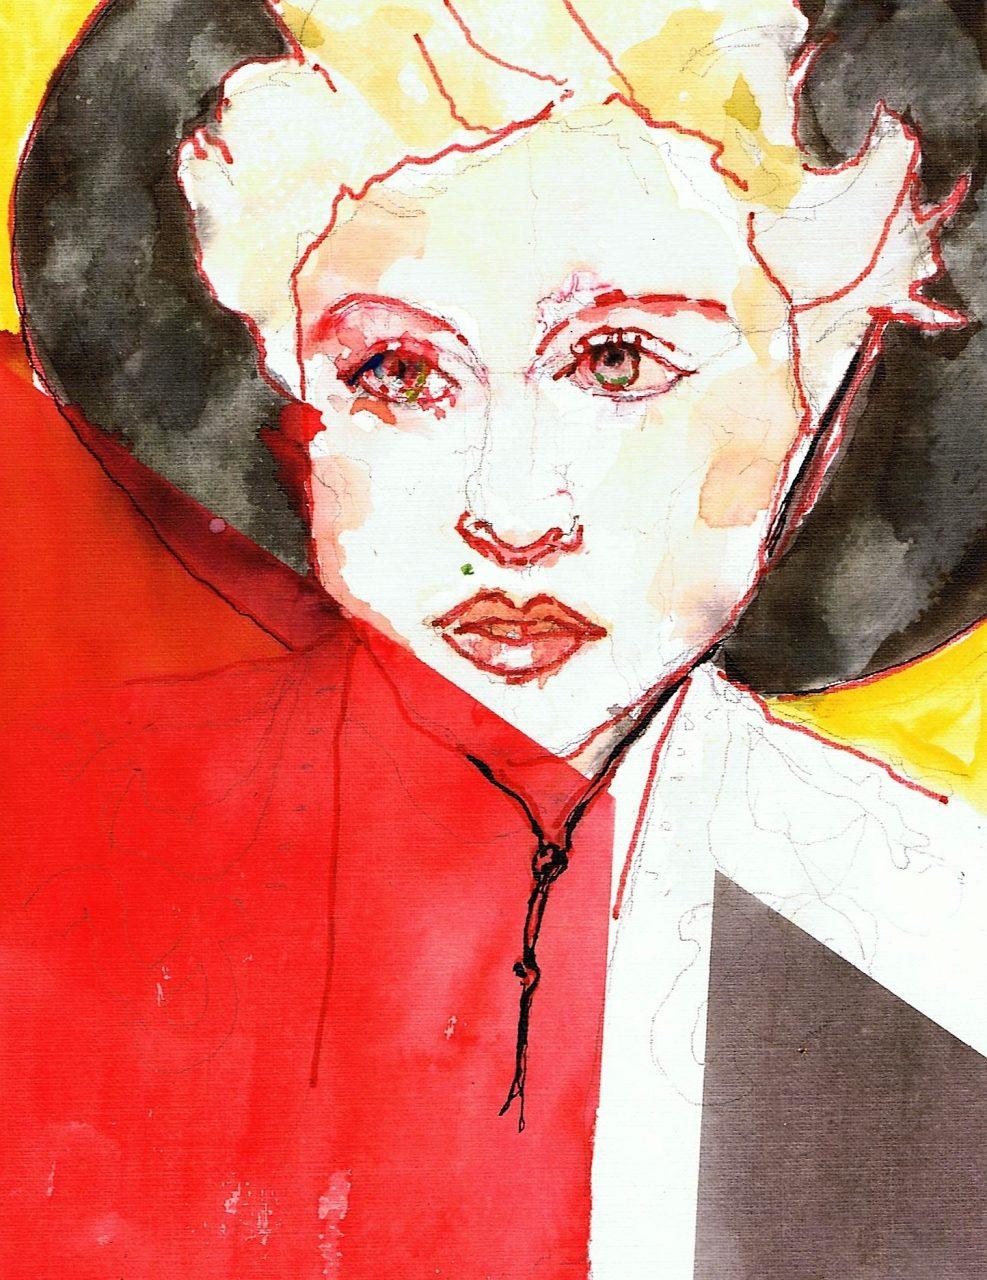 365 dagen een portret 162 Madonna, zangeres Viltstift en aquarel 19c25